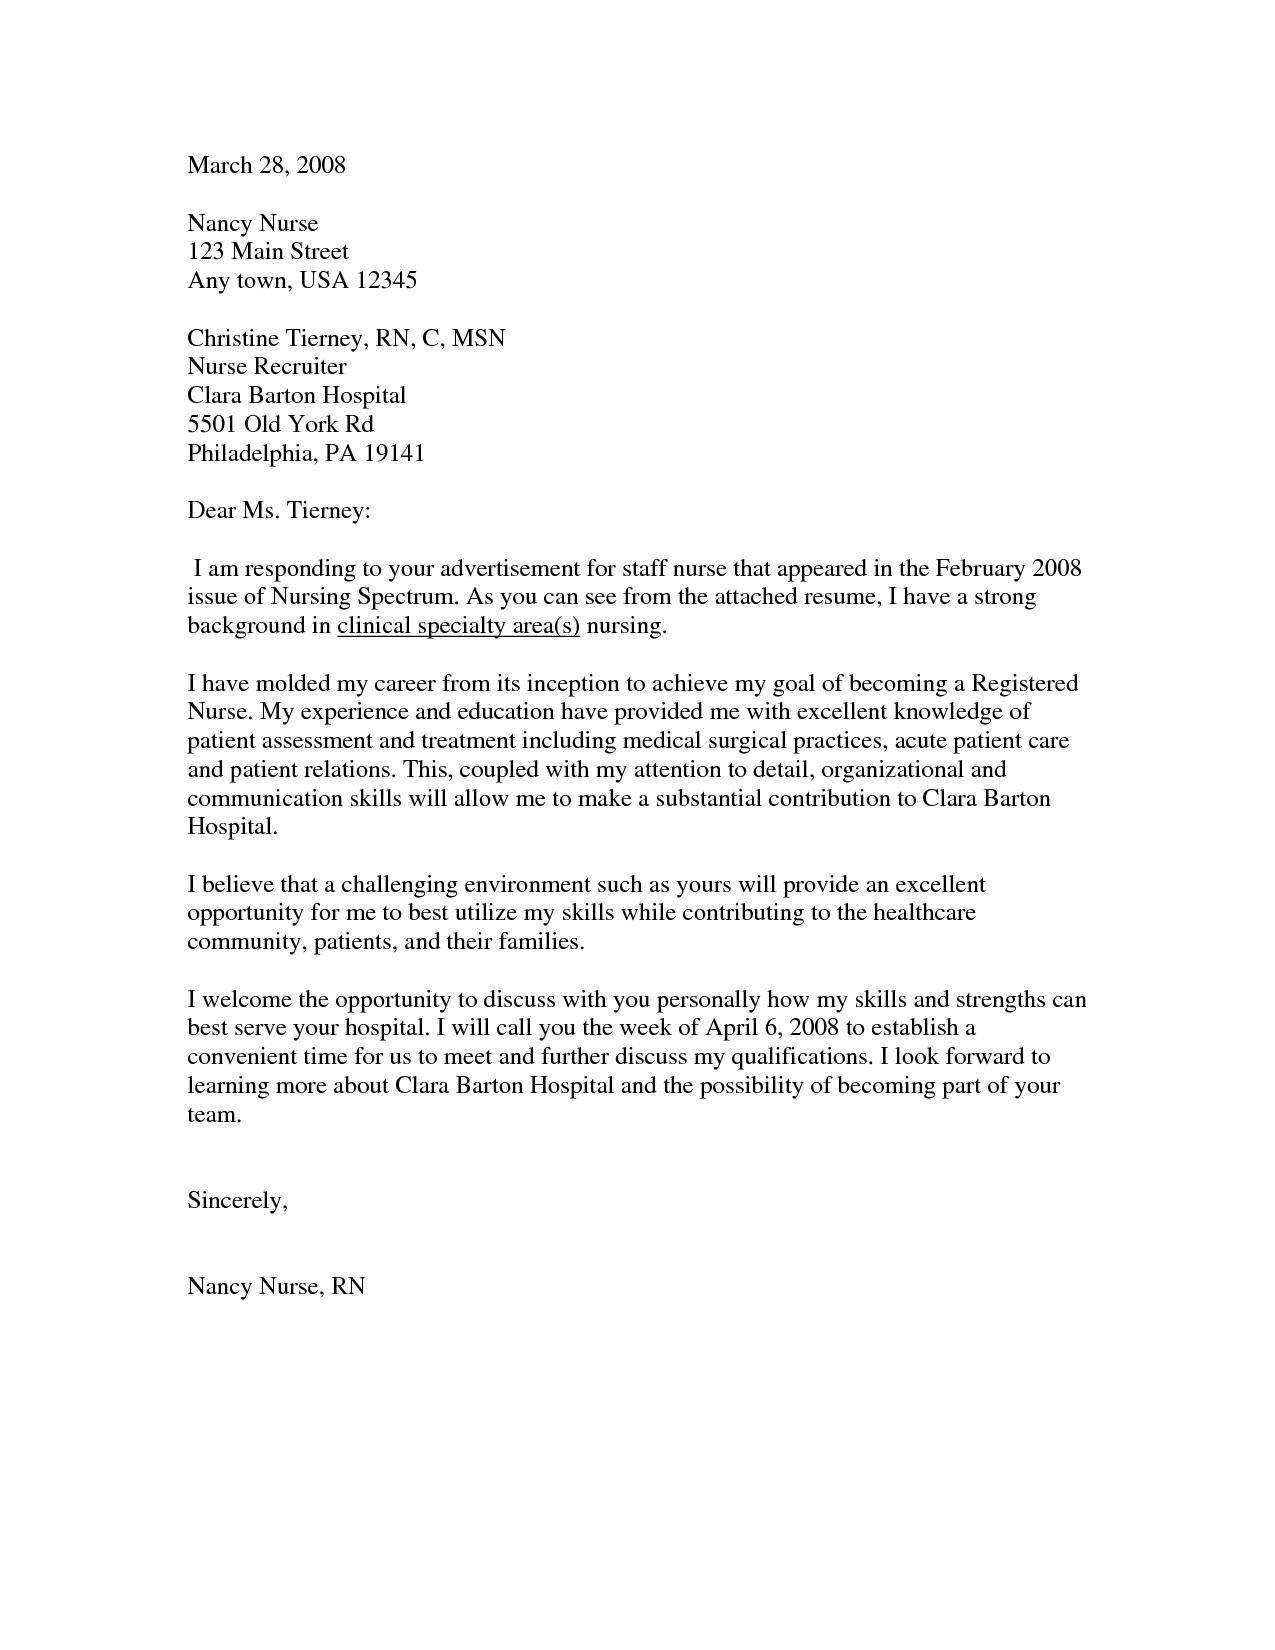 nursing cover letter new graduate examples